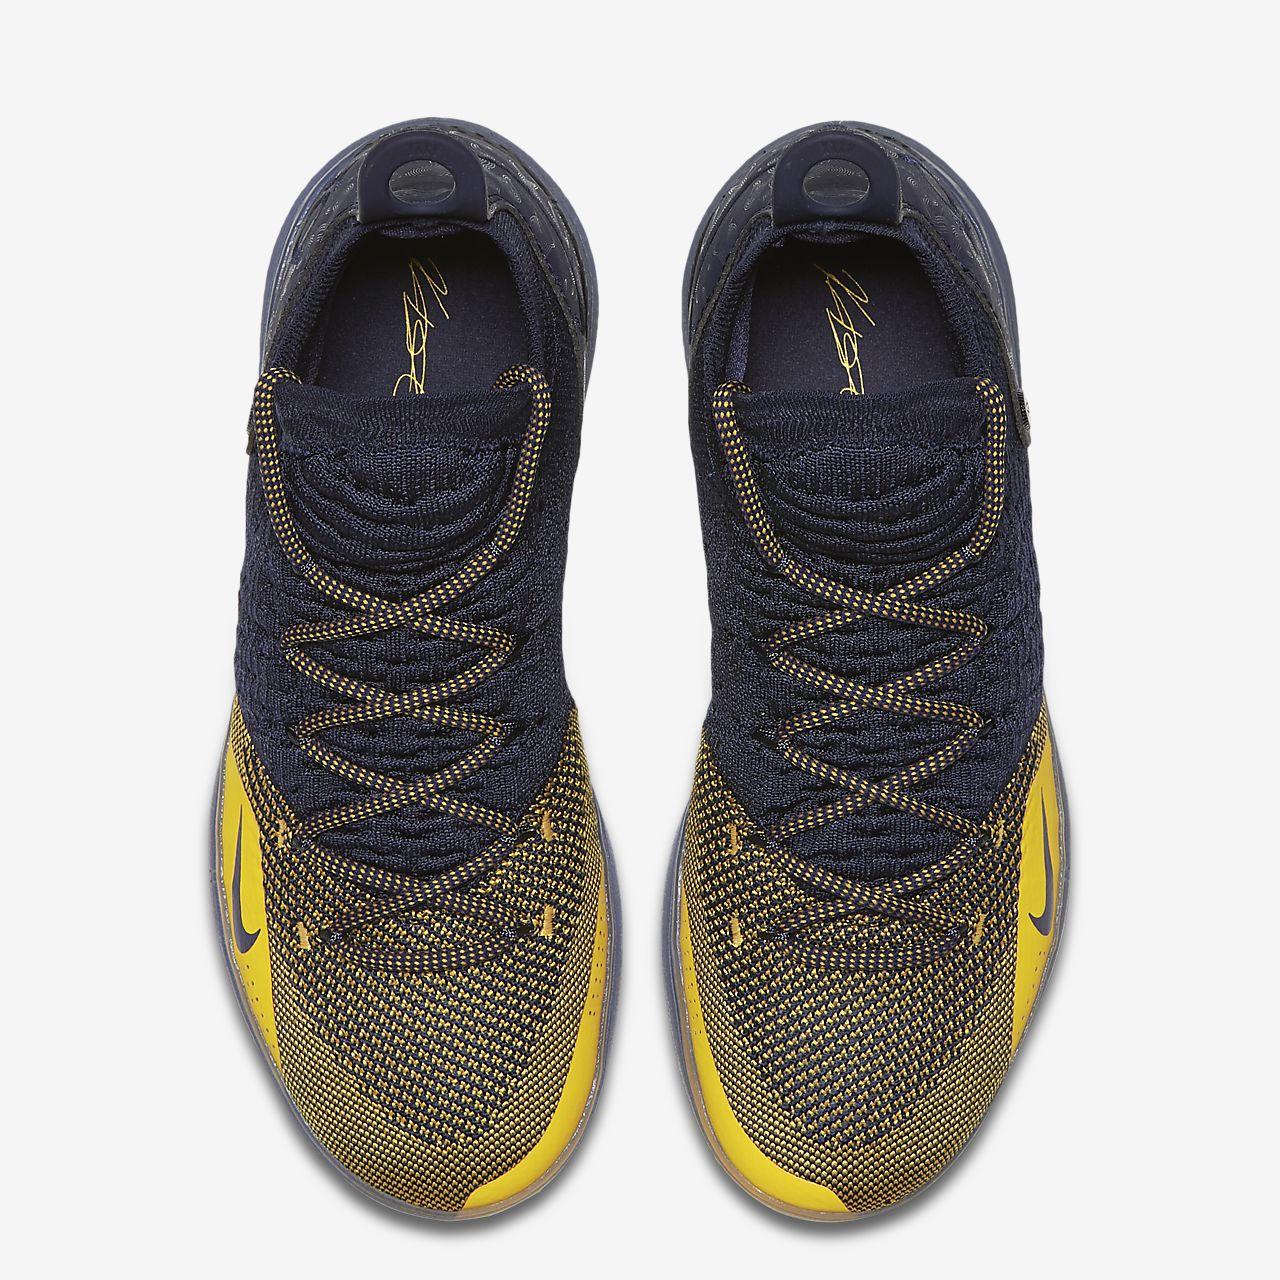 hot sales 0f897 7fd91 ... Nike Zoom KD11 Basketball Shoe